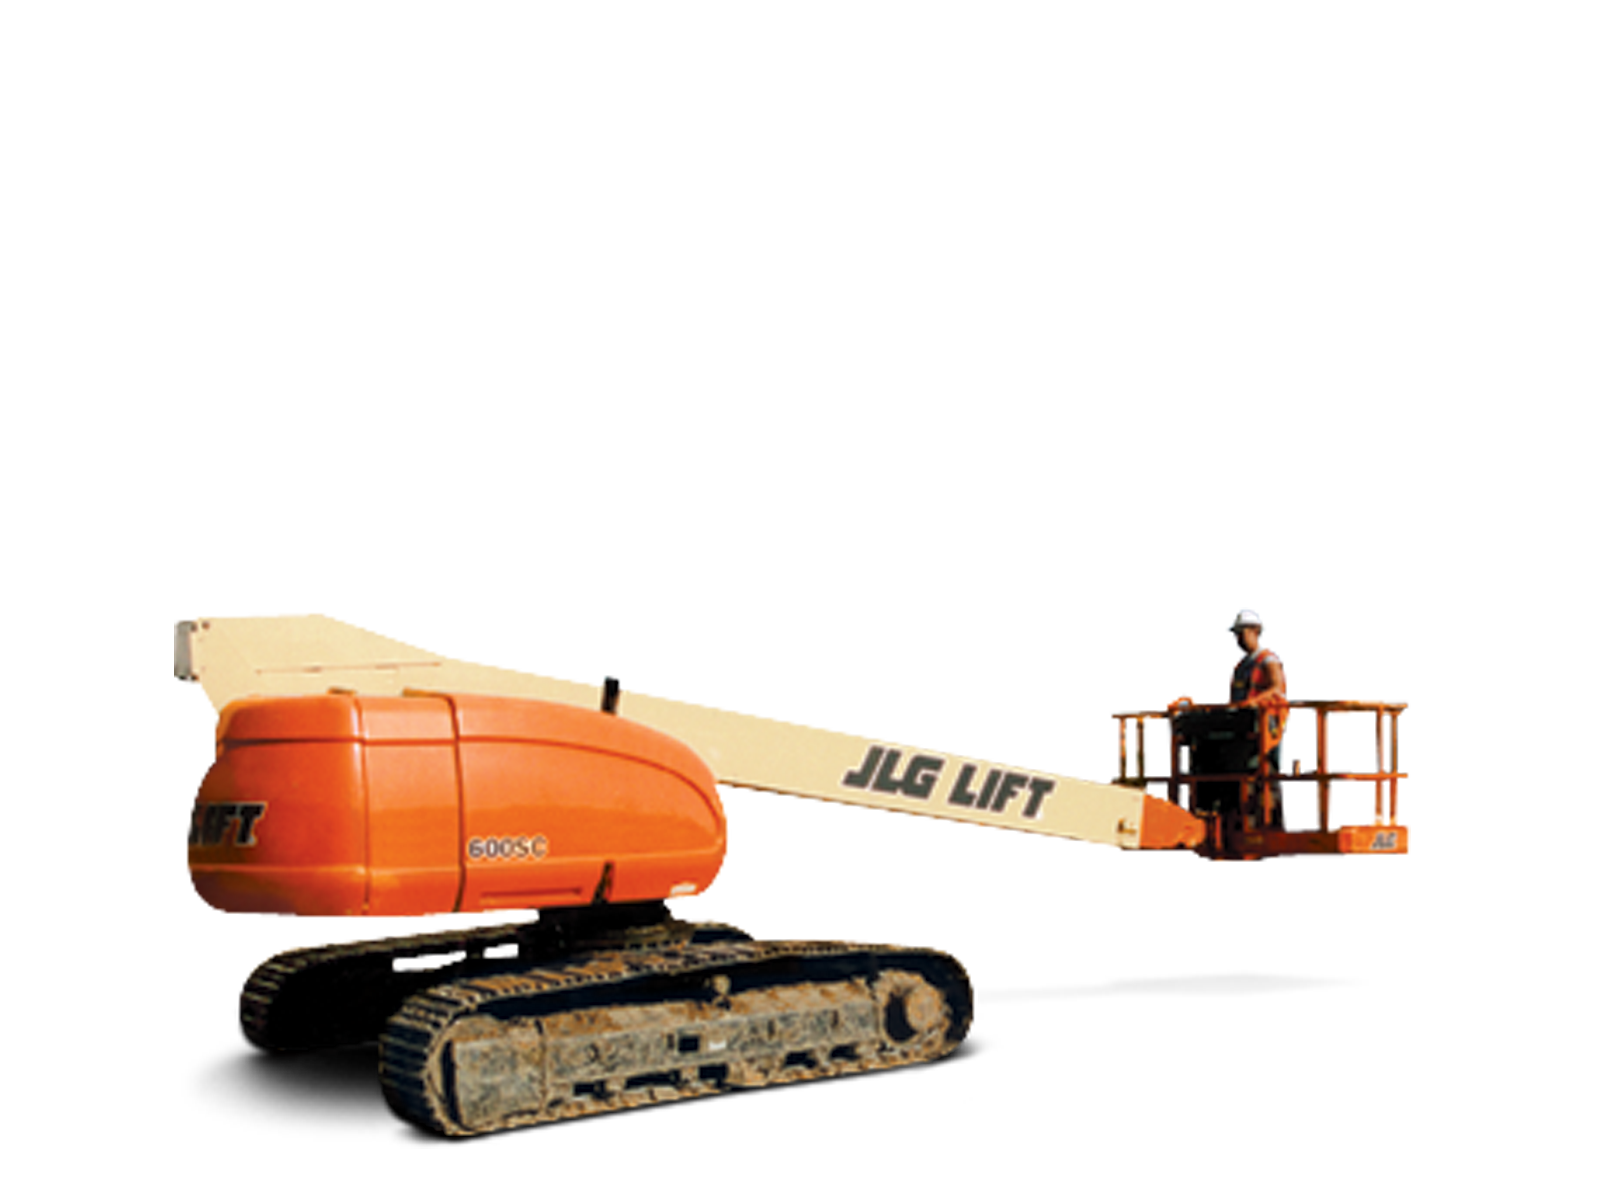 JLG 600SC